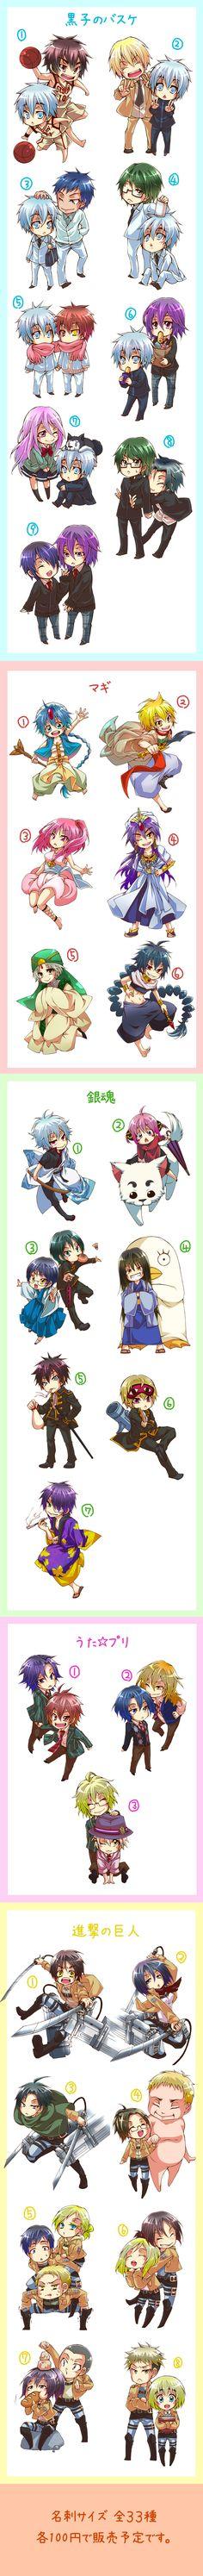 Anime 1) Kuroko no Basket, 2) Magi, 3) not sure what this one is from 4) Uta No Prince Sama, 5) Attack On Titan